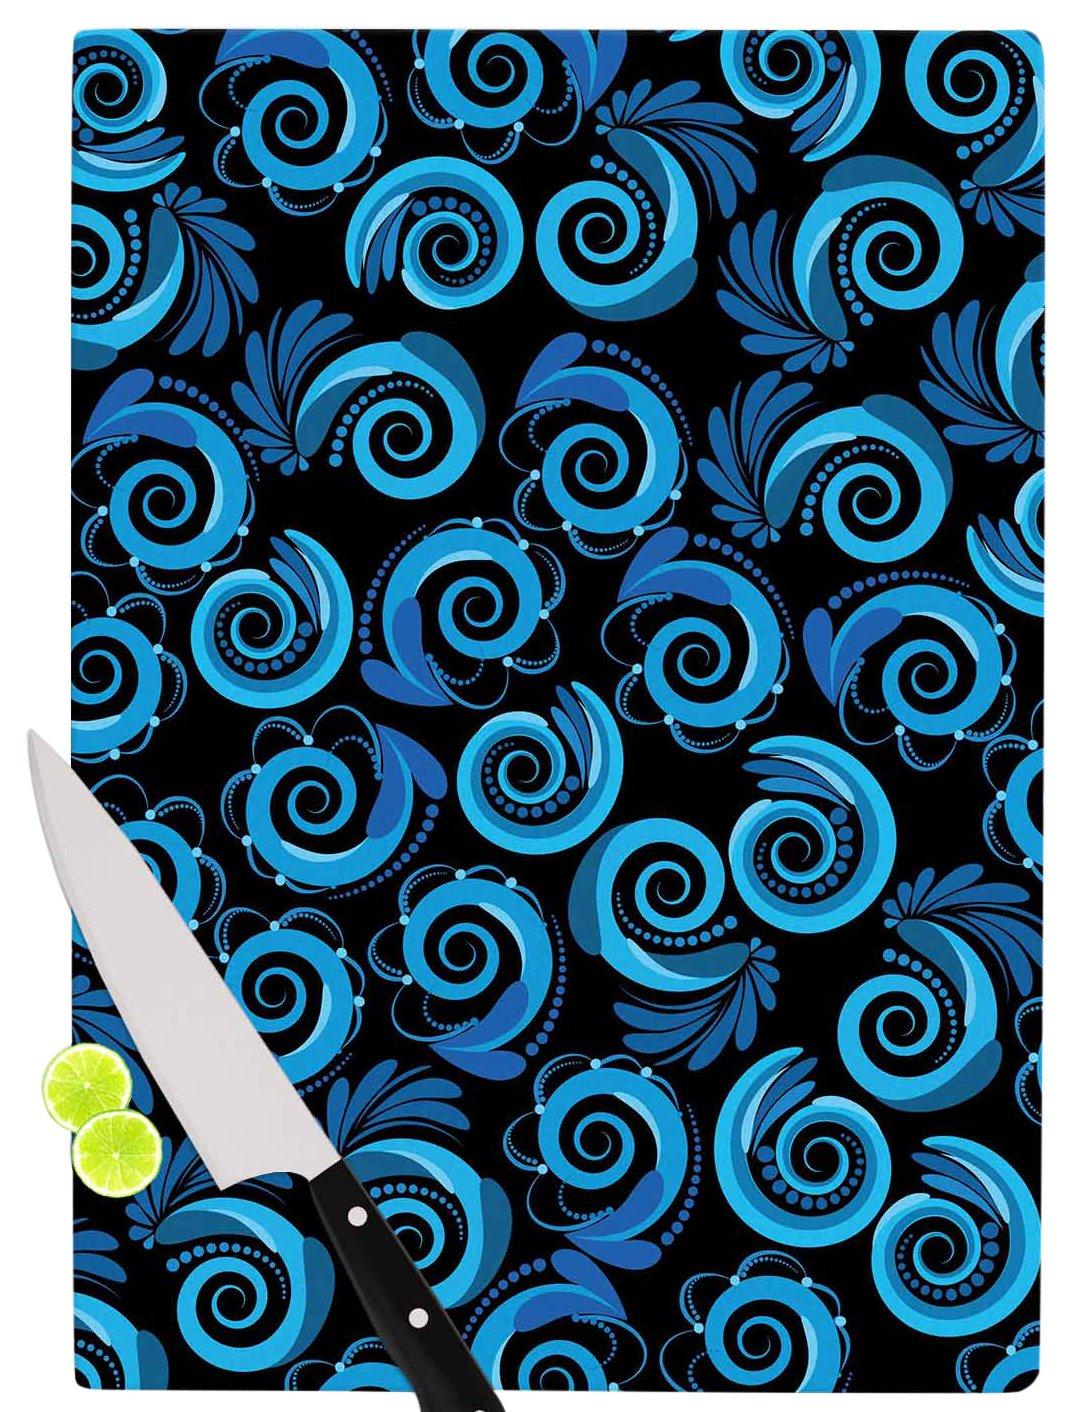 KESS InHouse Maria BazarovaBlue Waves Black Aqua Cutting Board 11.5 x 15.75 Multicolor